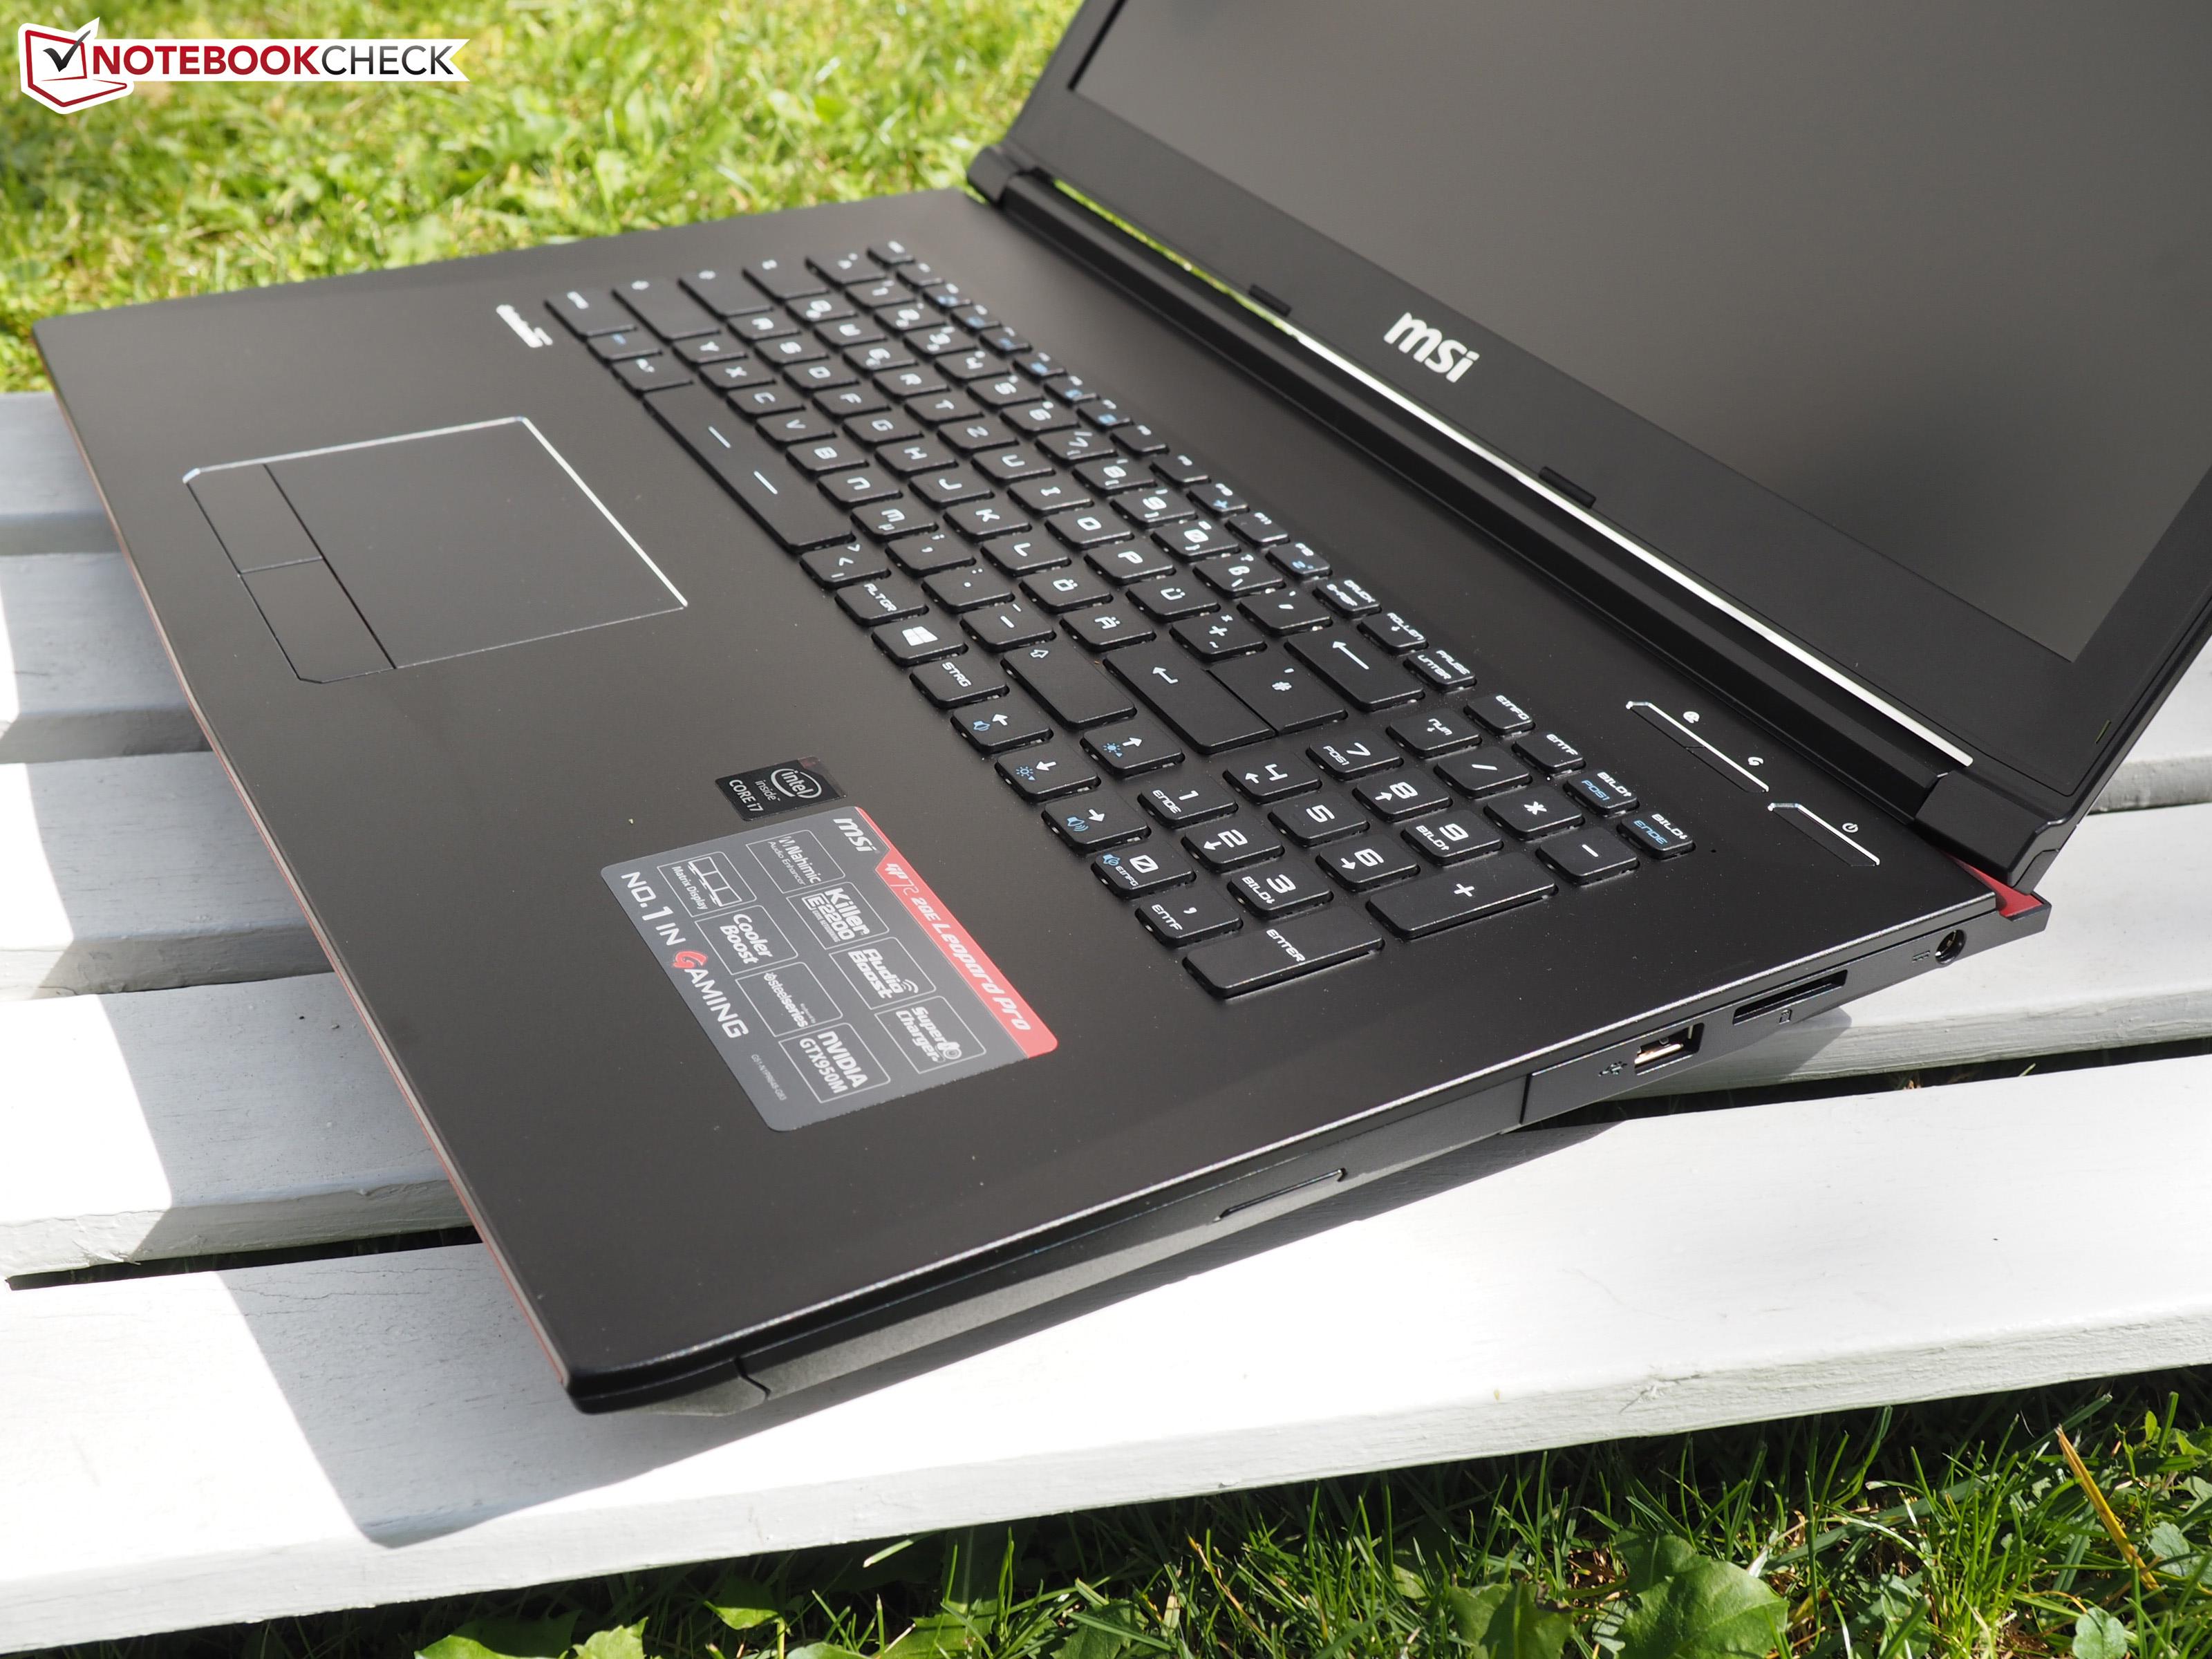 MSI GP70 2QE Leopard Synaptics Touchpad Windows 7